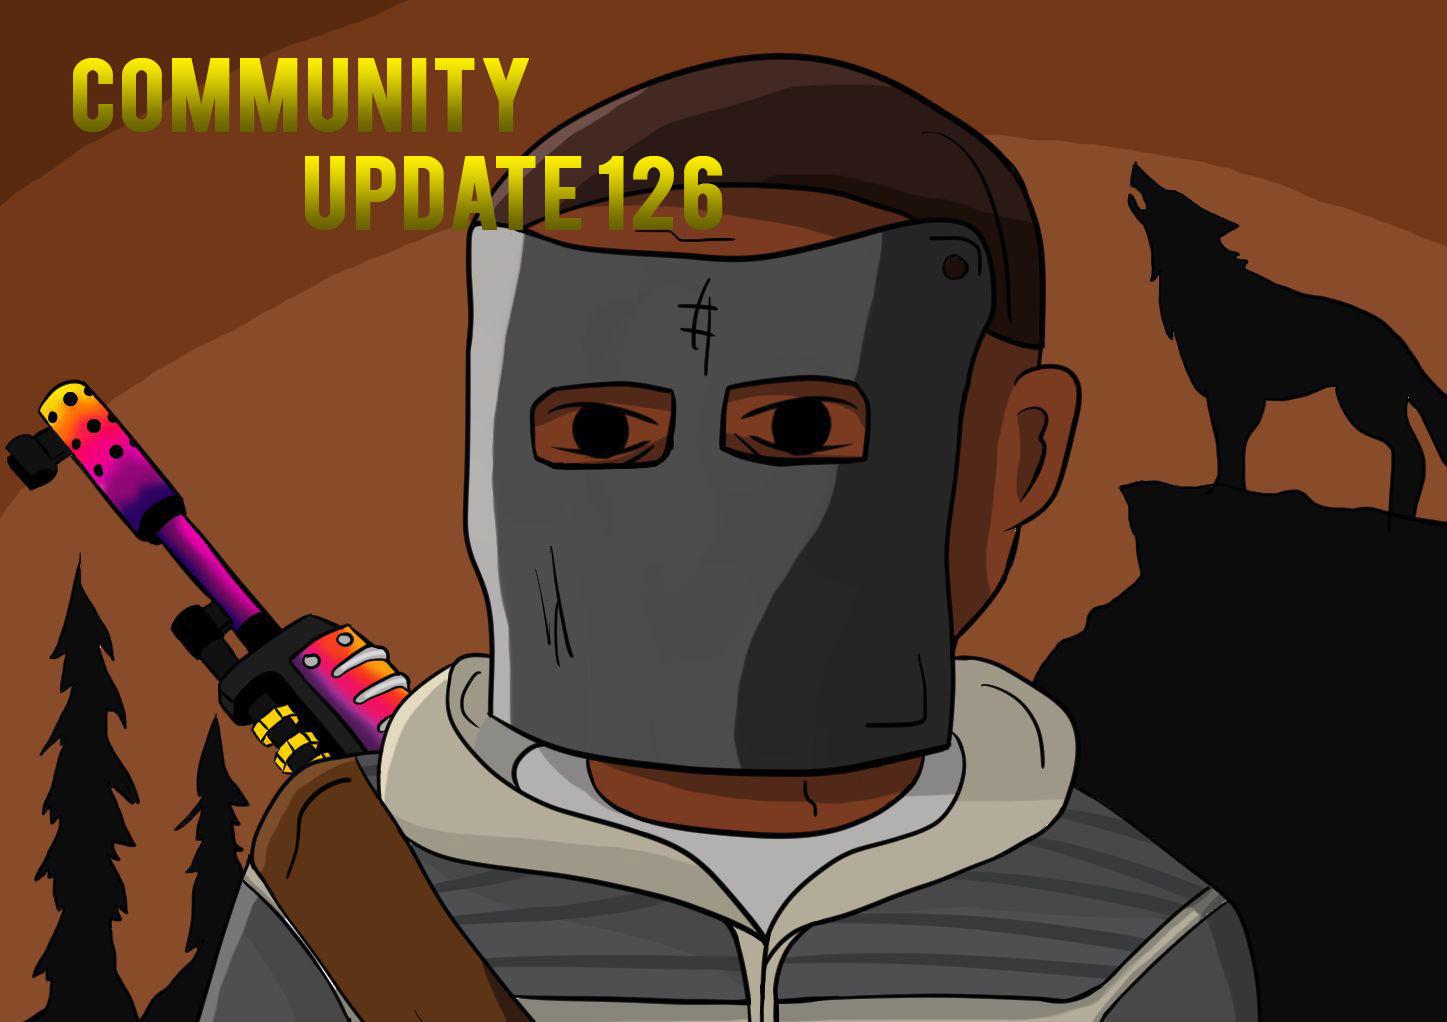 Community Update 126